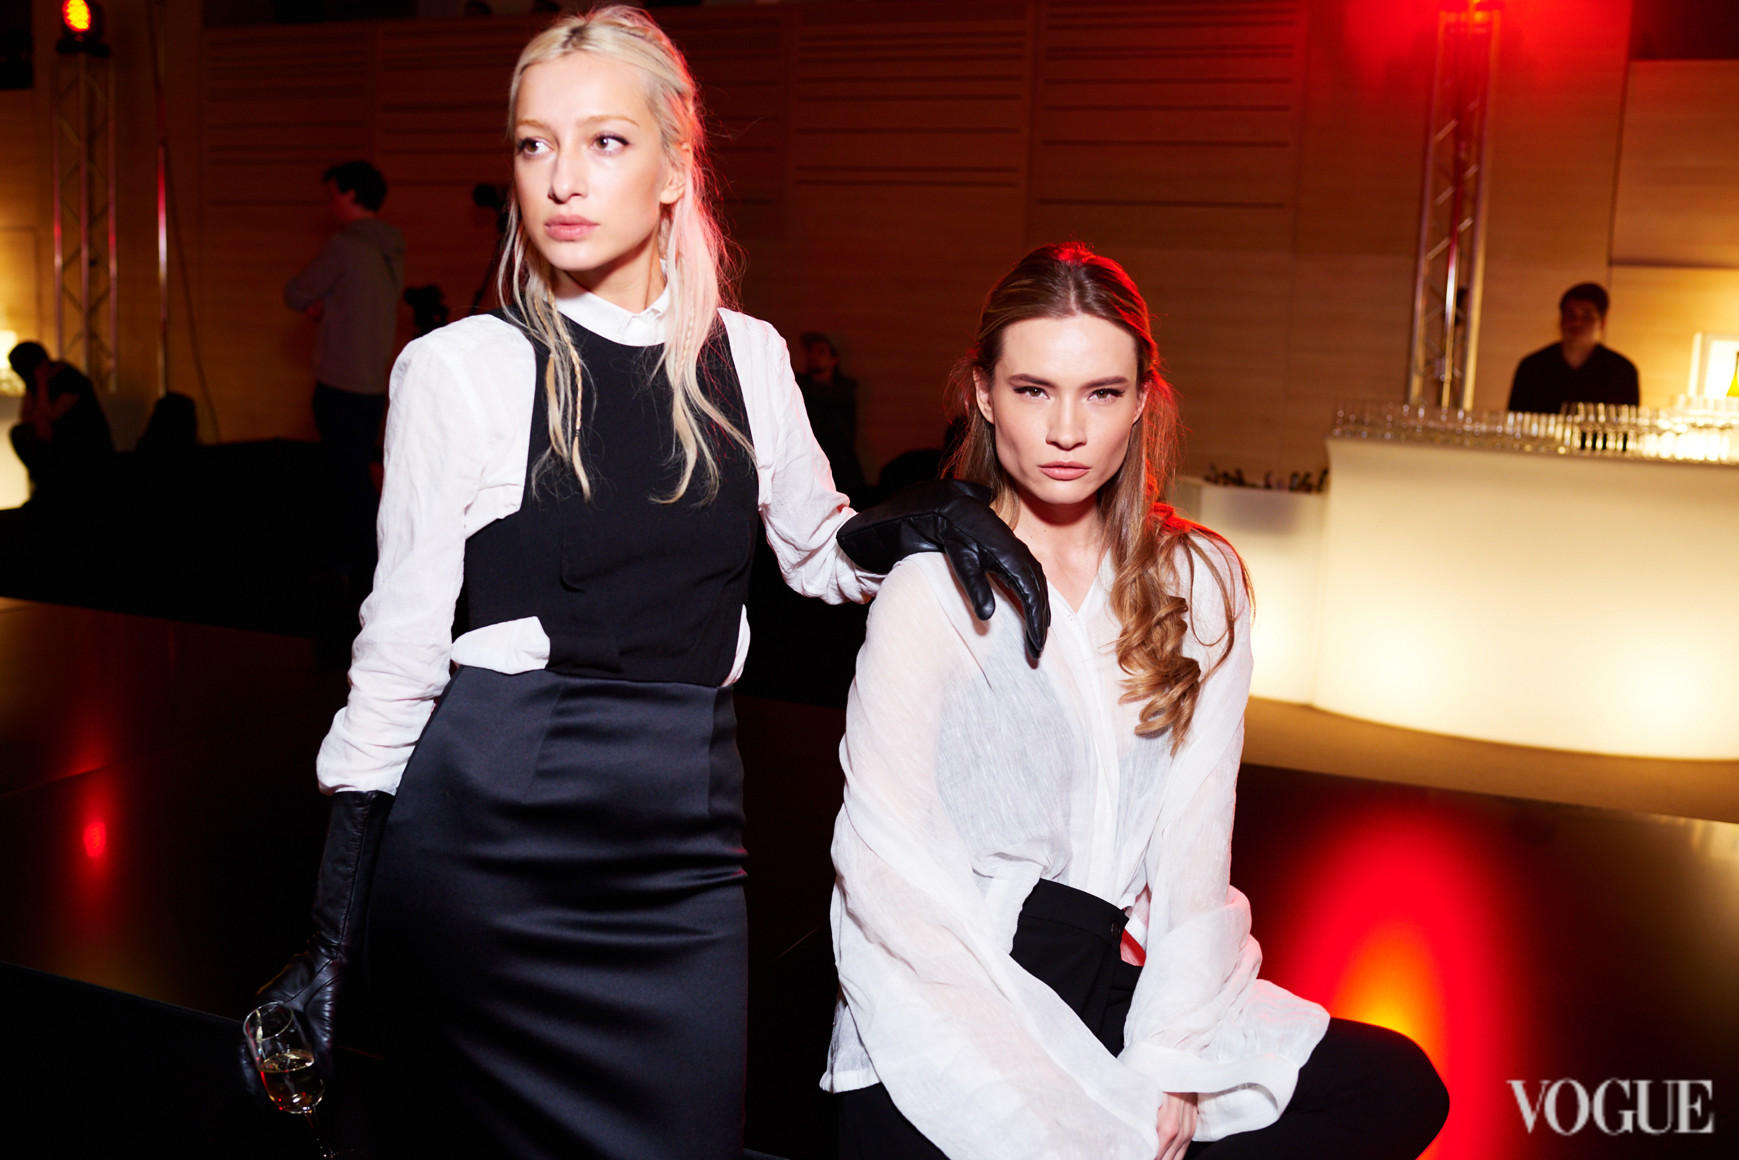 Олимпия Вайтмусташ и Татьяна Богдан